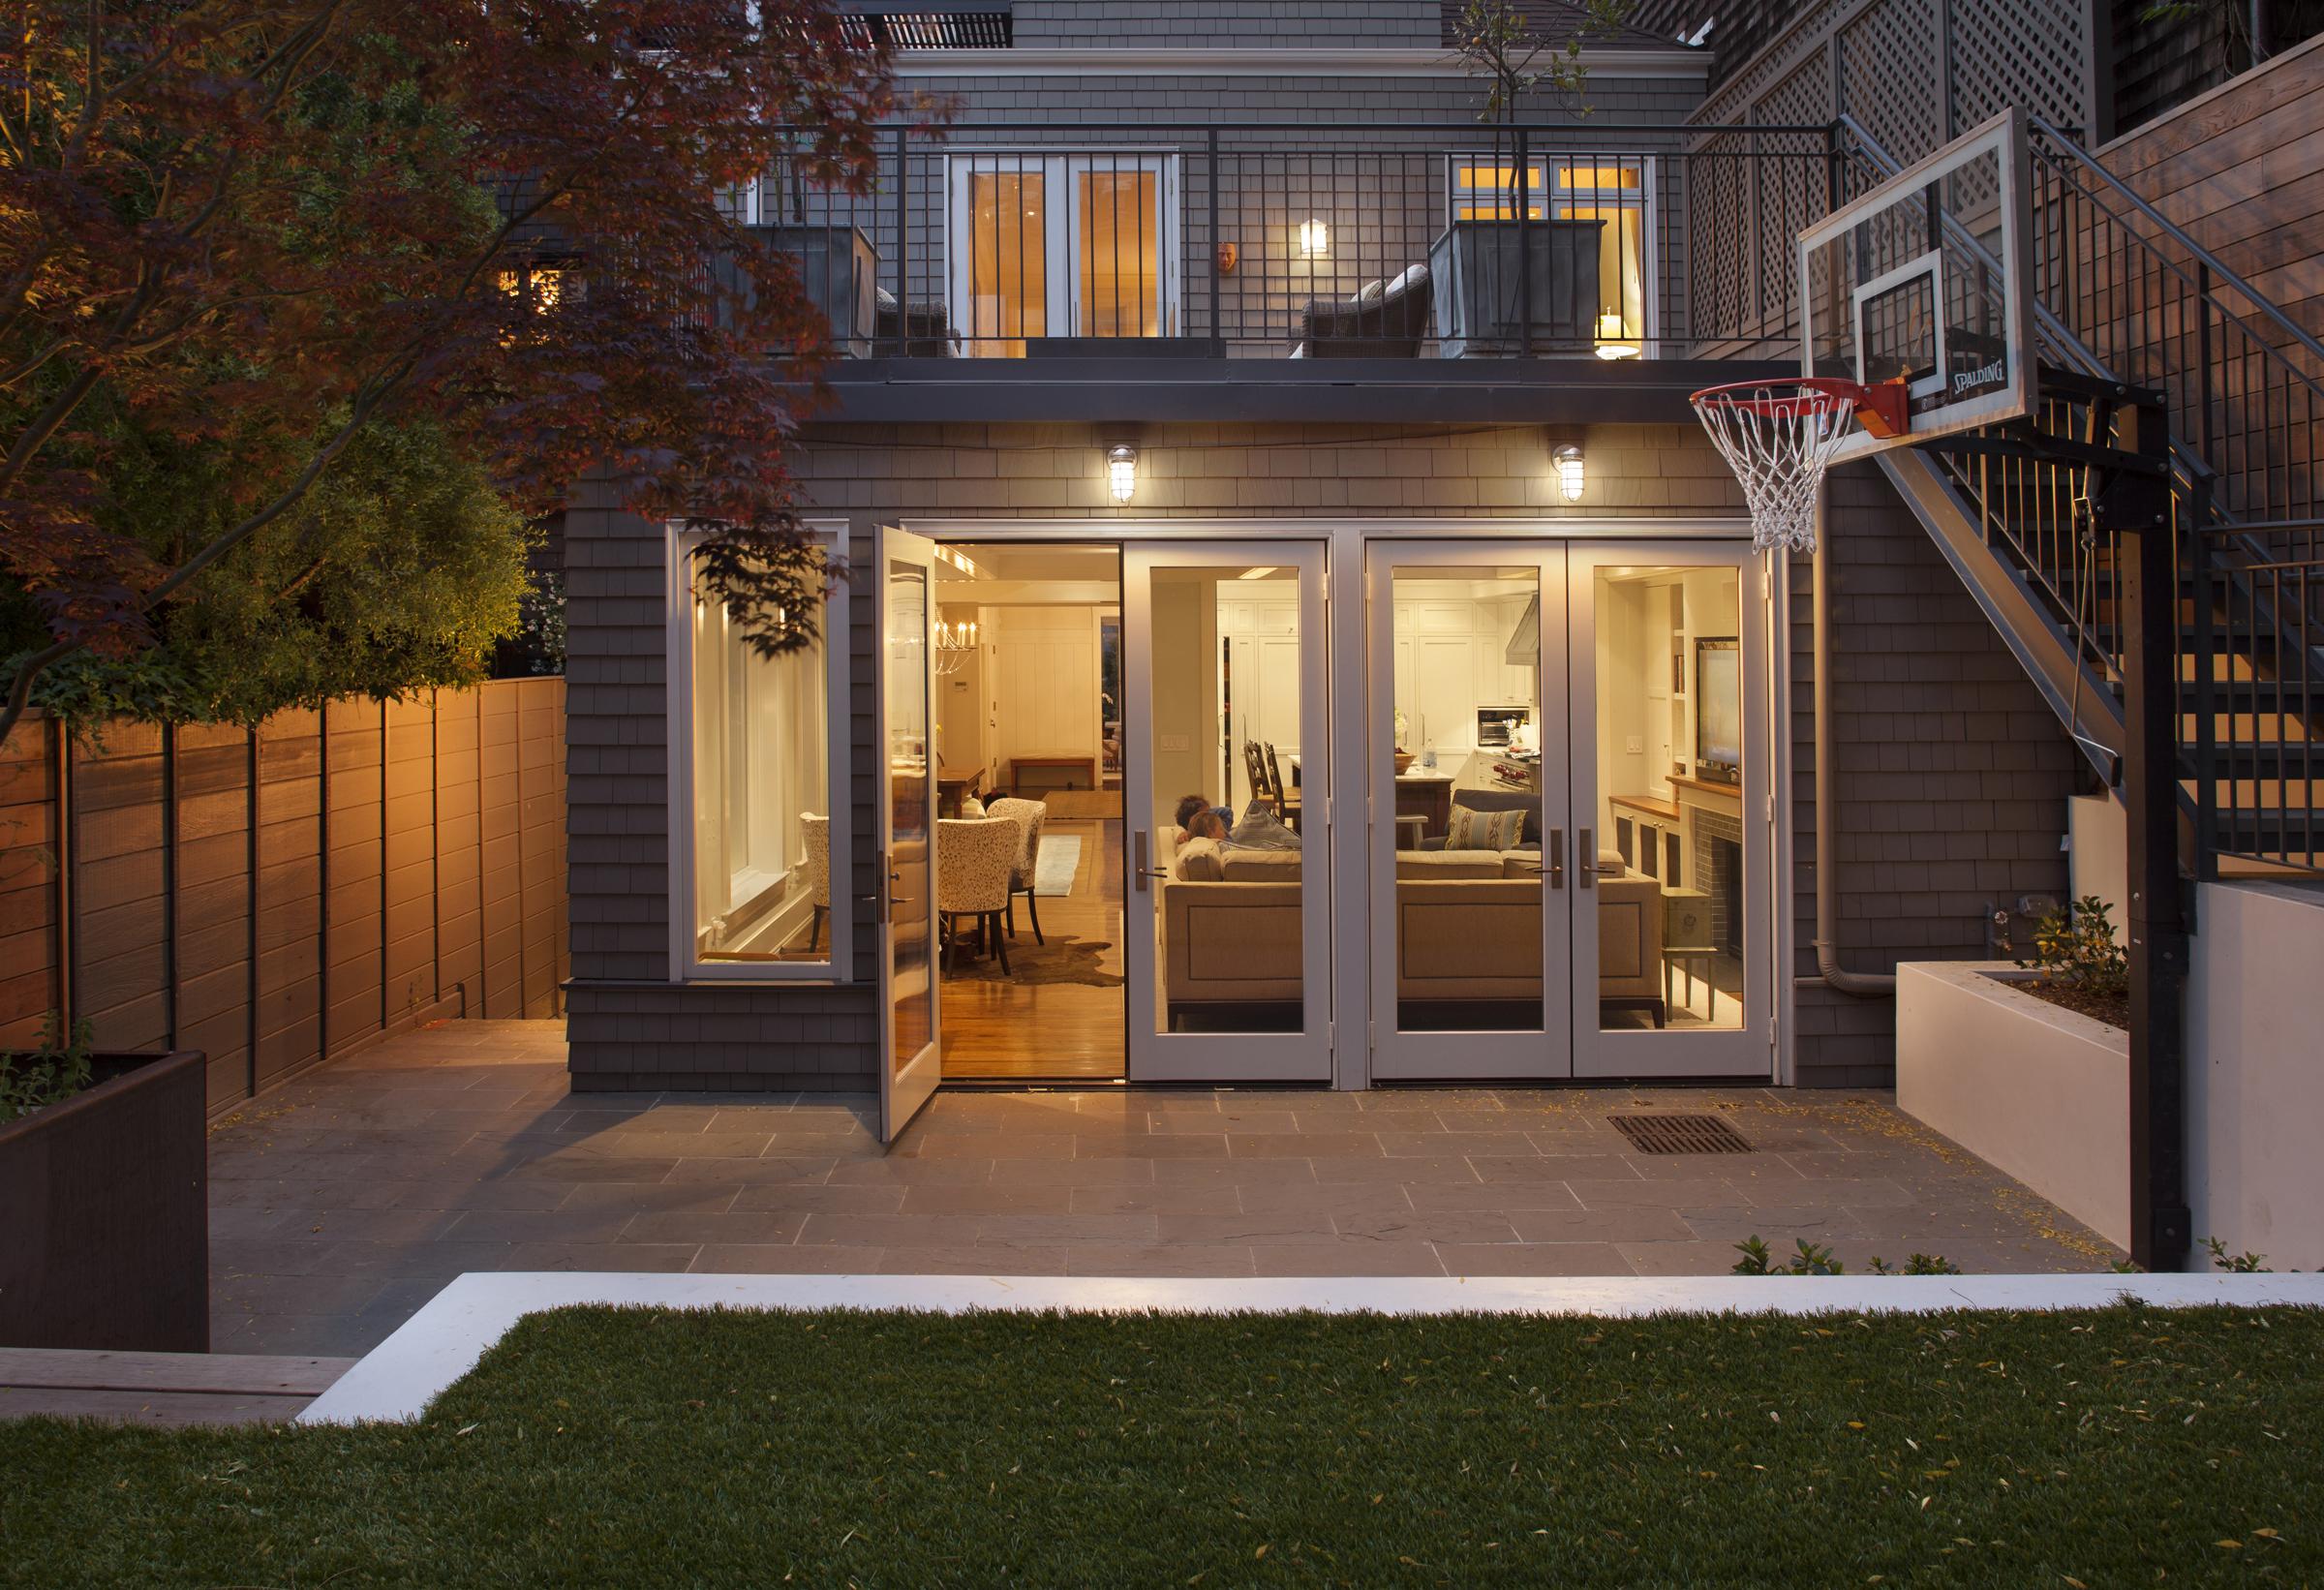 Basketball Hoop and Astroturf lawn